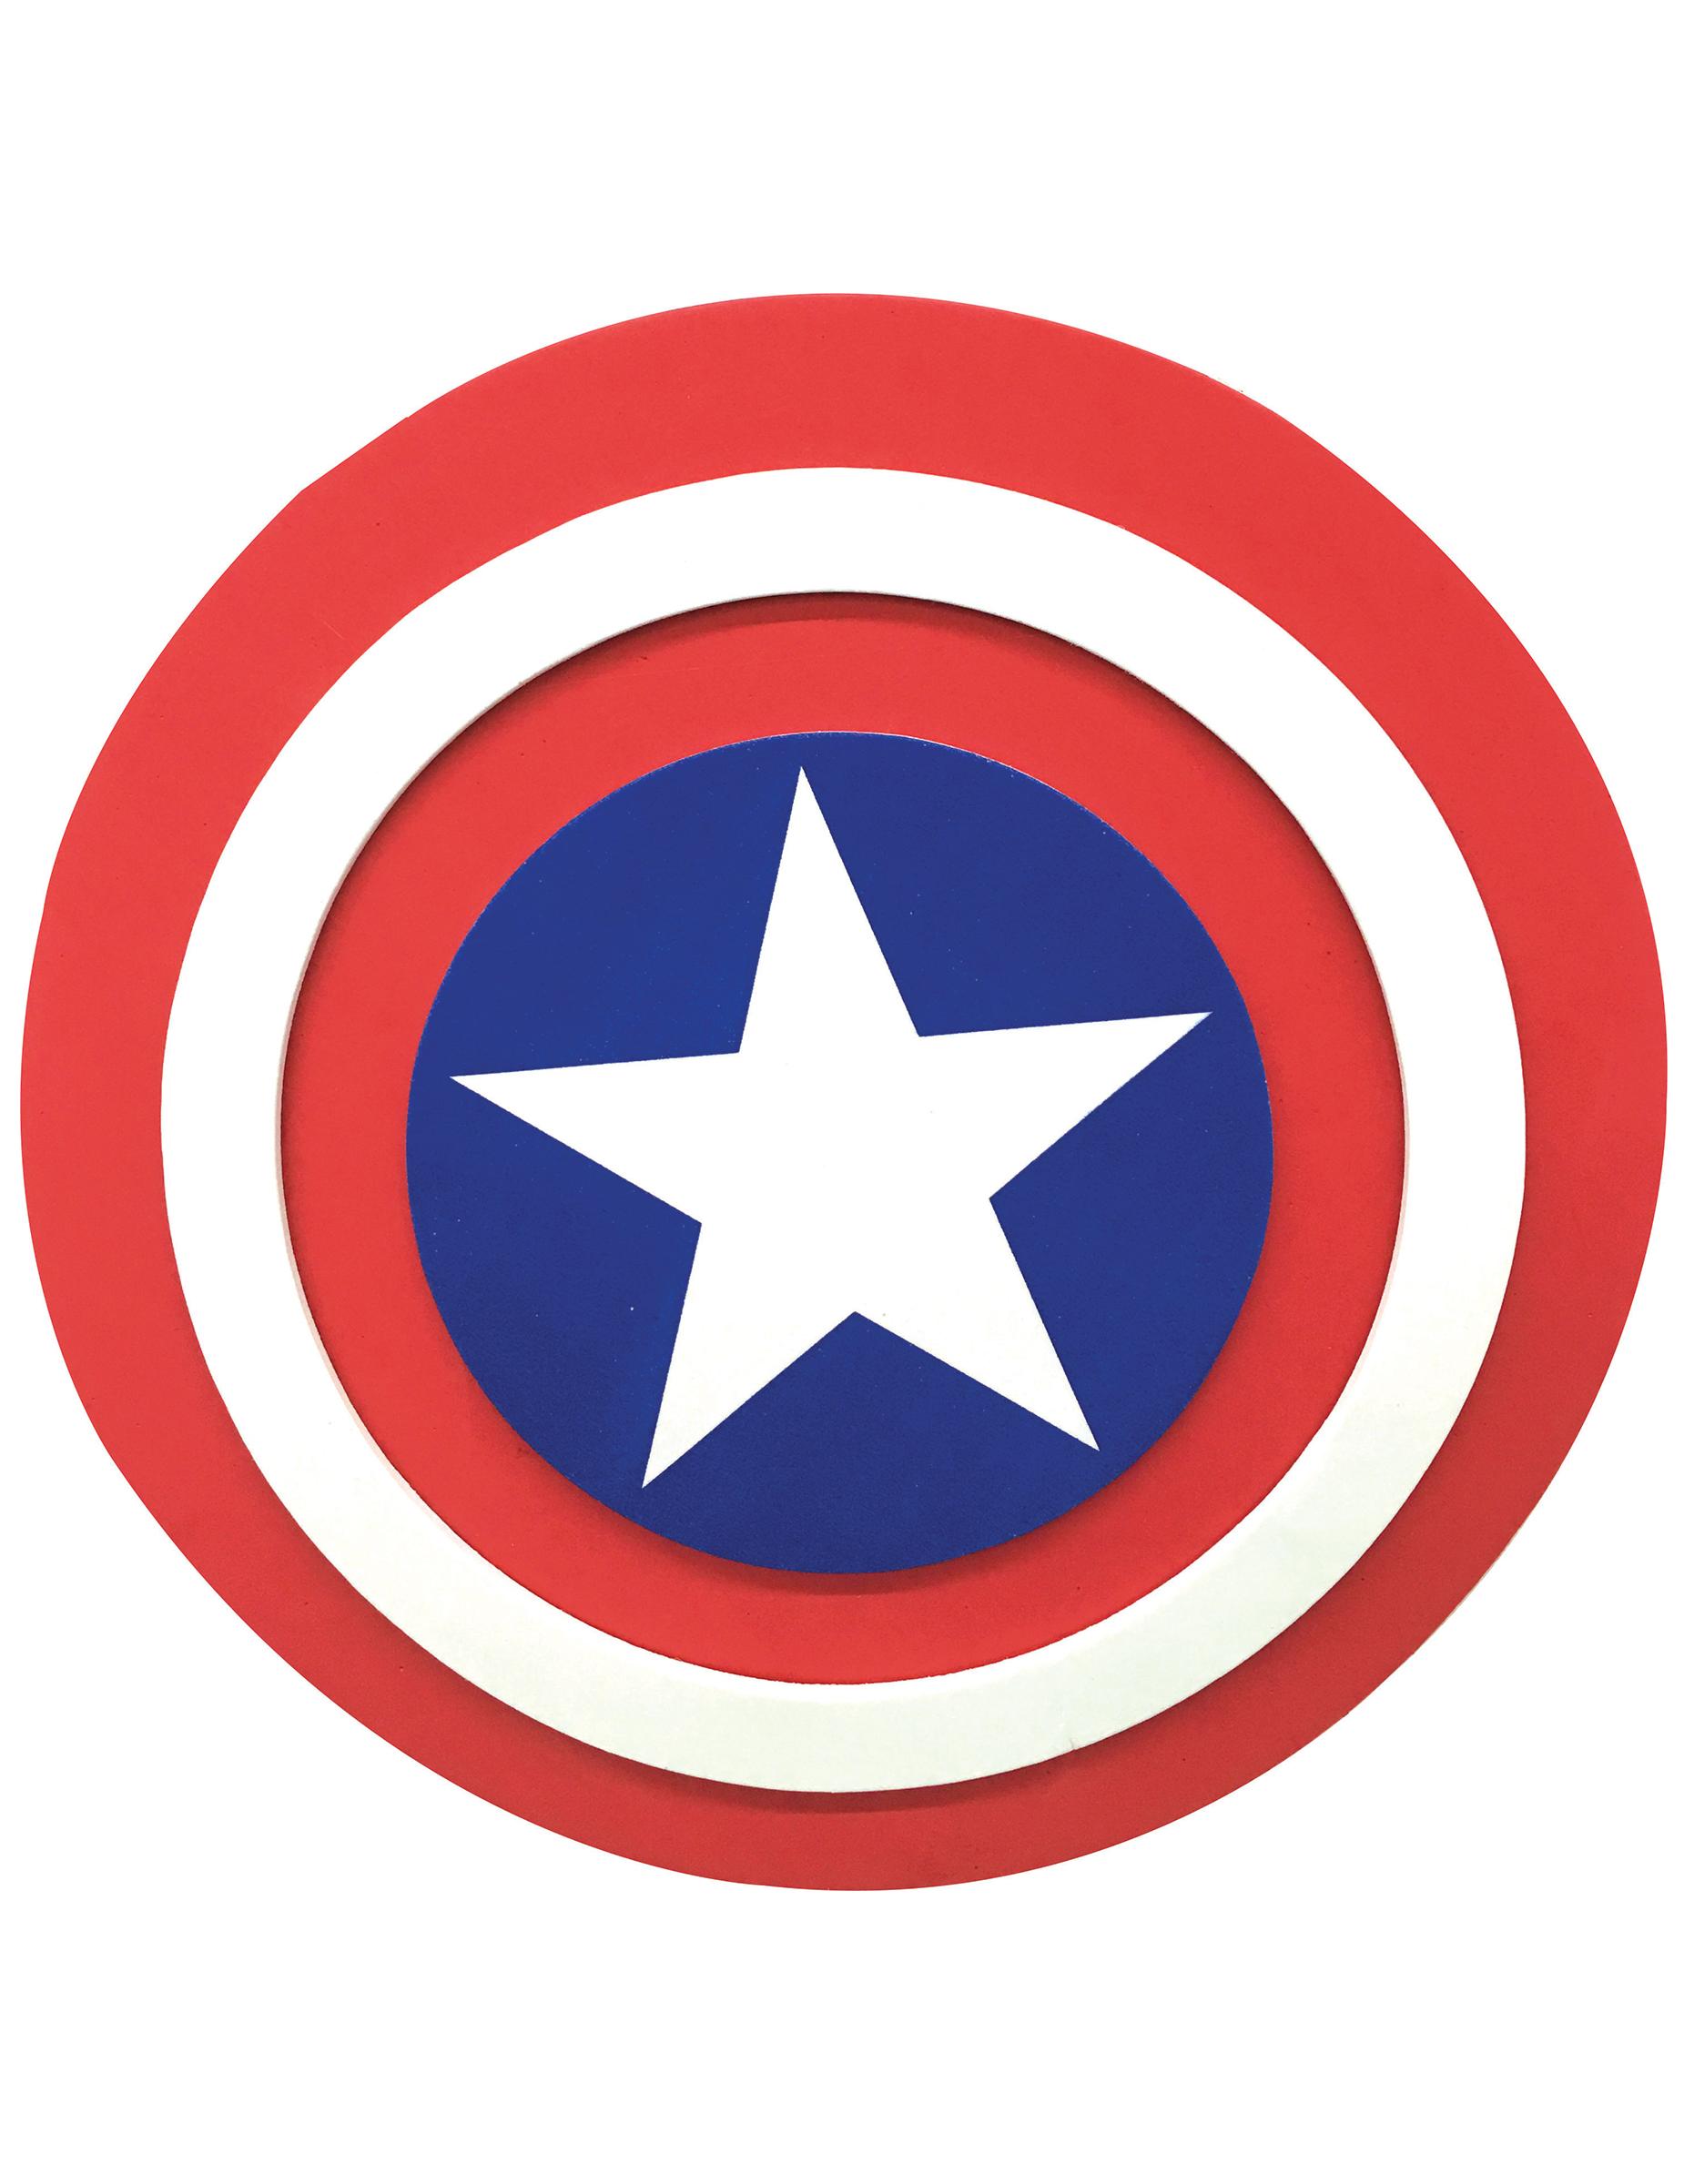 captain america schild f r kinder weiss rot blau 30 cm g nstige faschings accessoires. Black Bedroom Furniture Sets. Home Design Ideas